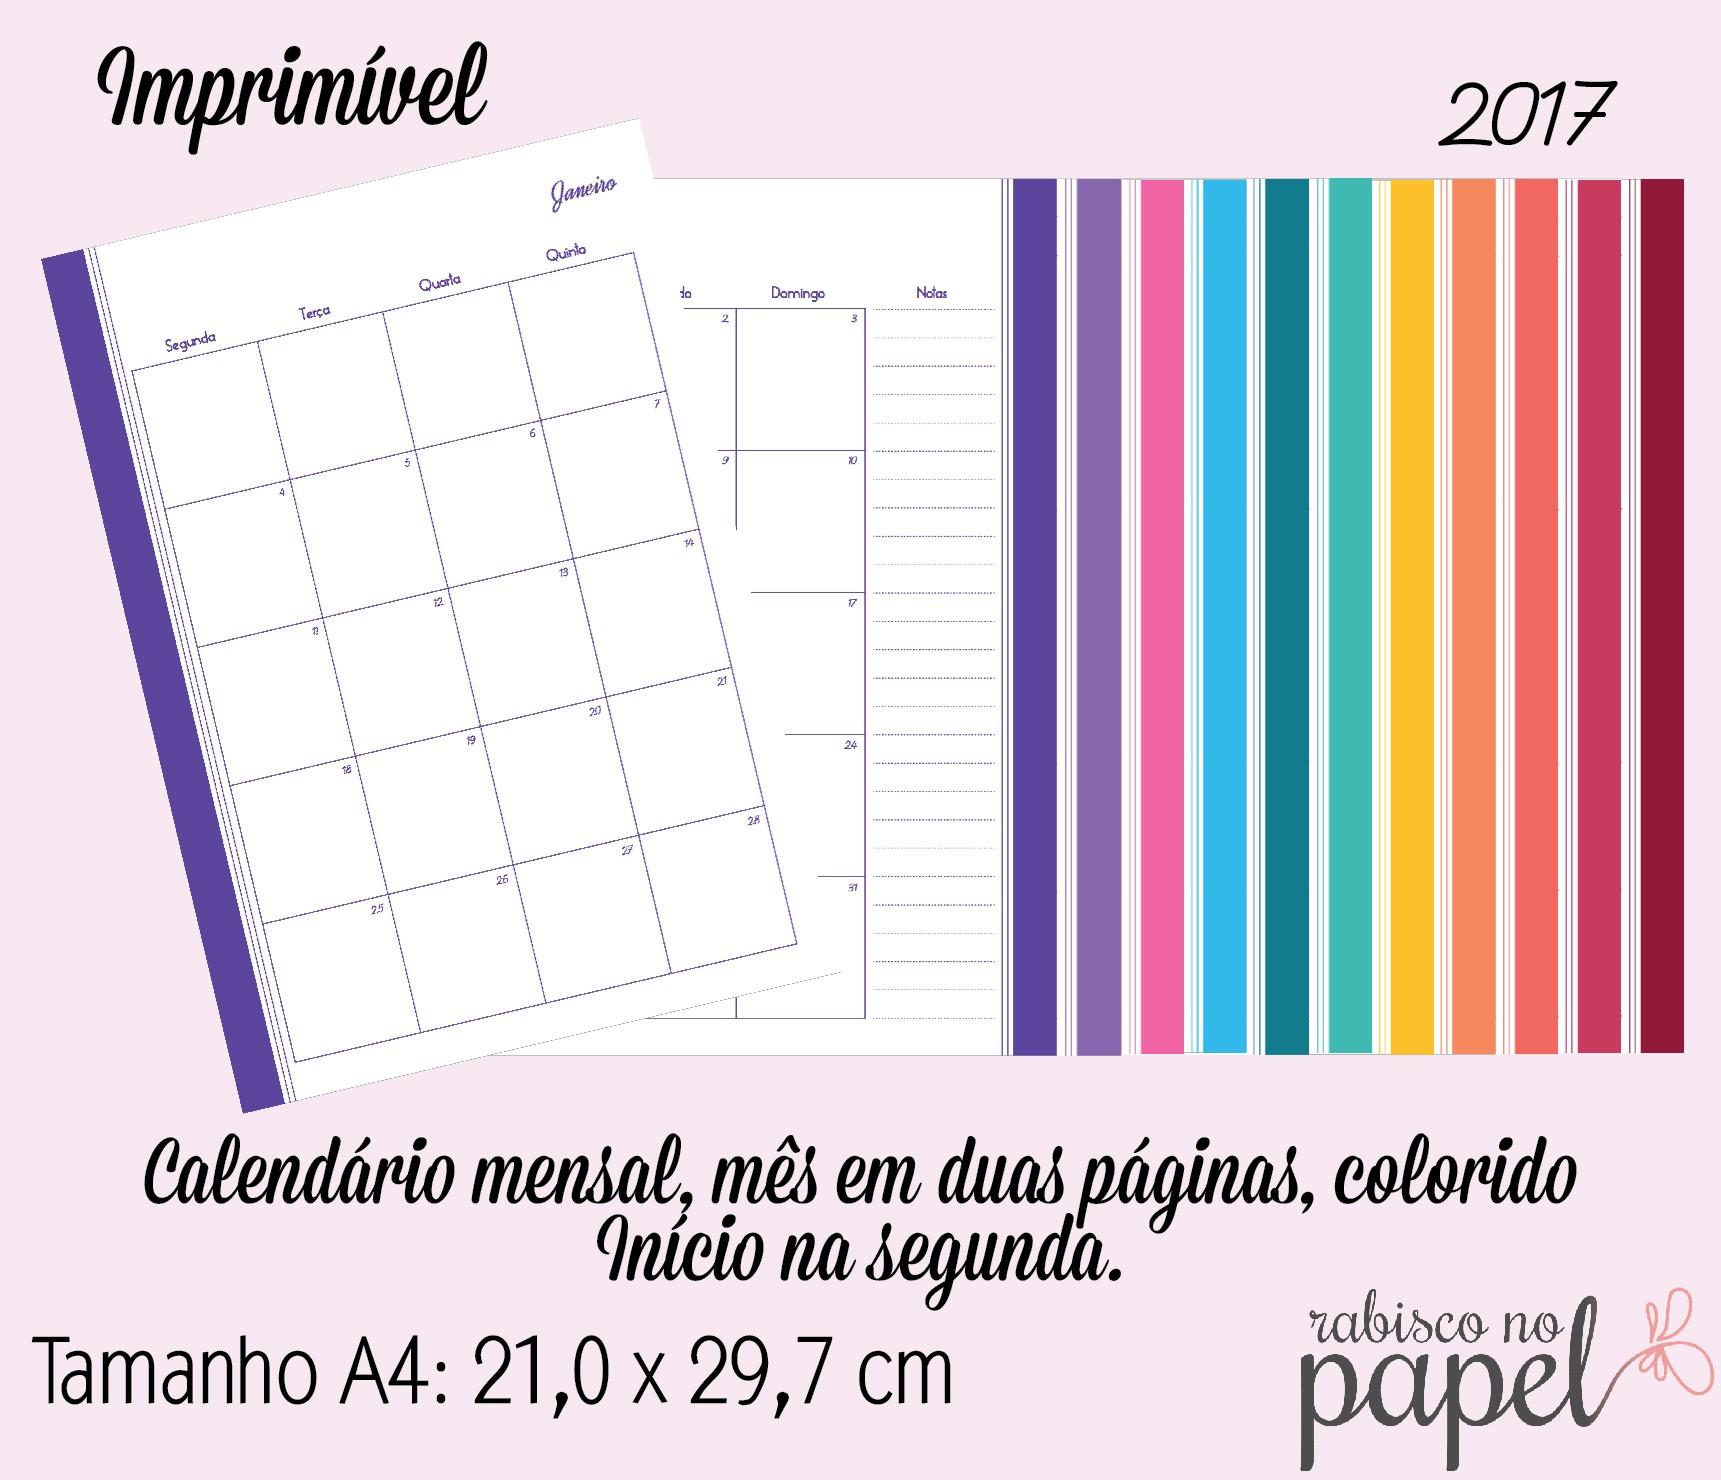 Calendario Mes Dezembro 2017 Para Imprimir Recientes Agenda Para Imprimir Of Calendario Mes Dezembro 2017 Para Imprimir Más Reciente Happy Planner Imprimible Gratis 2017 Dodlees Pinterest